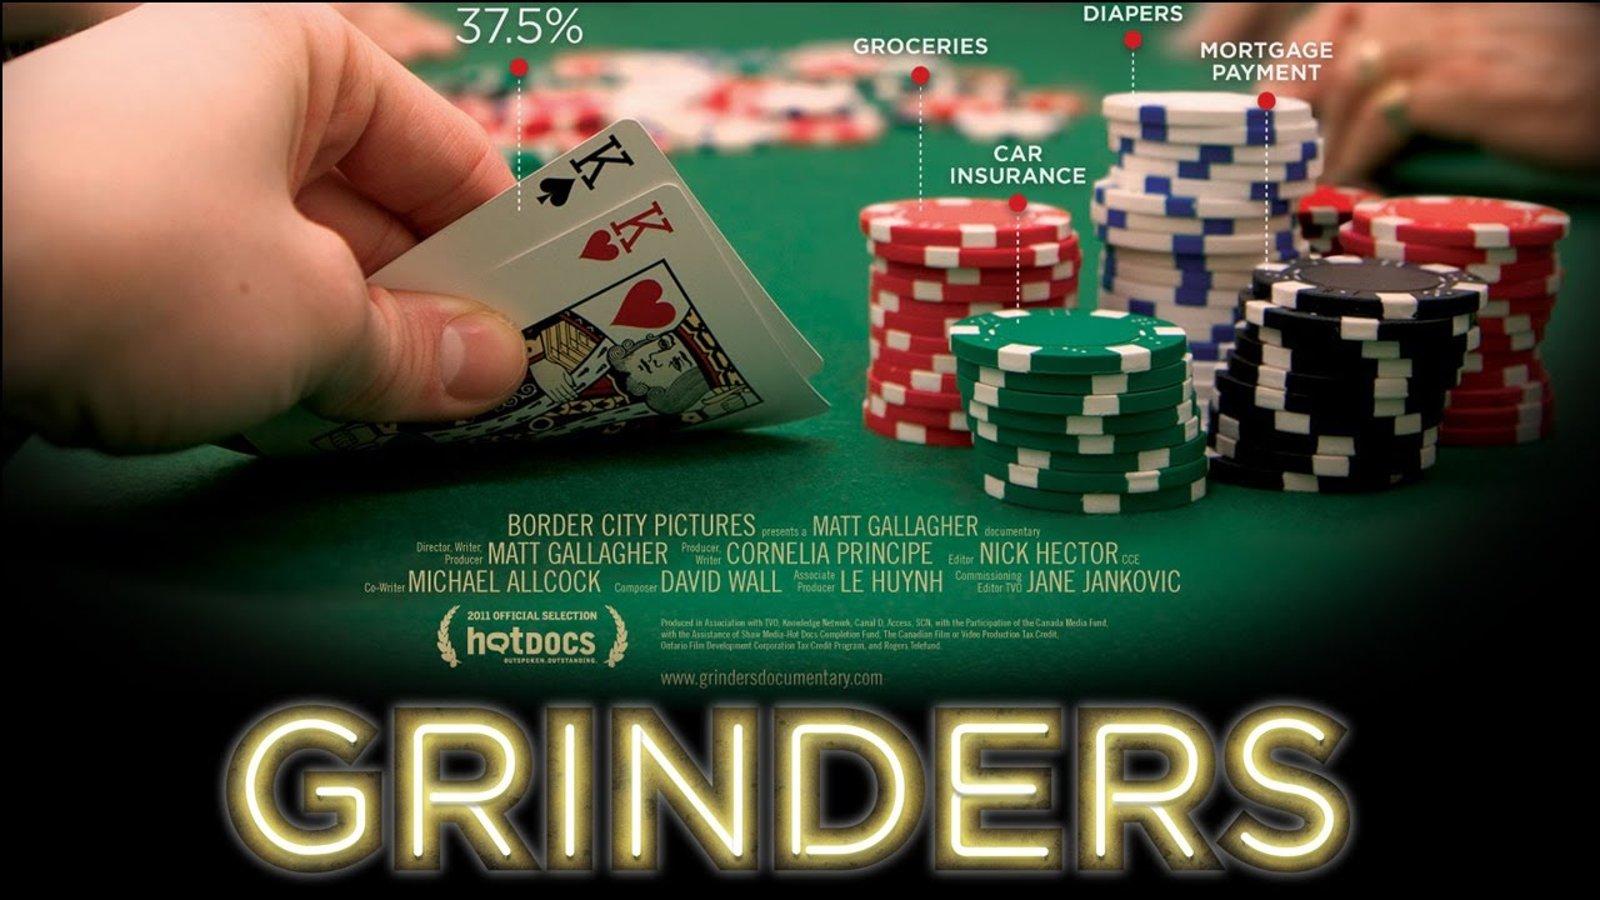 Grinders - The Underground World of Illegal Poker